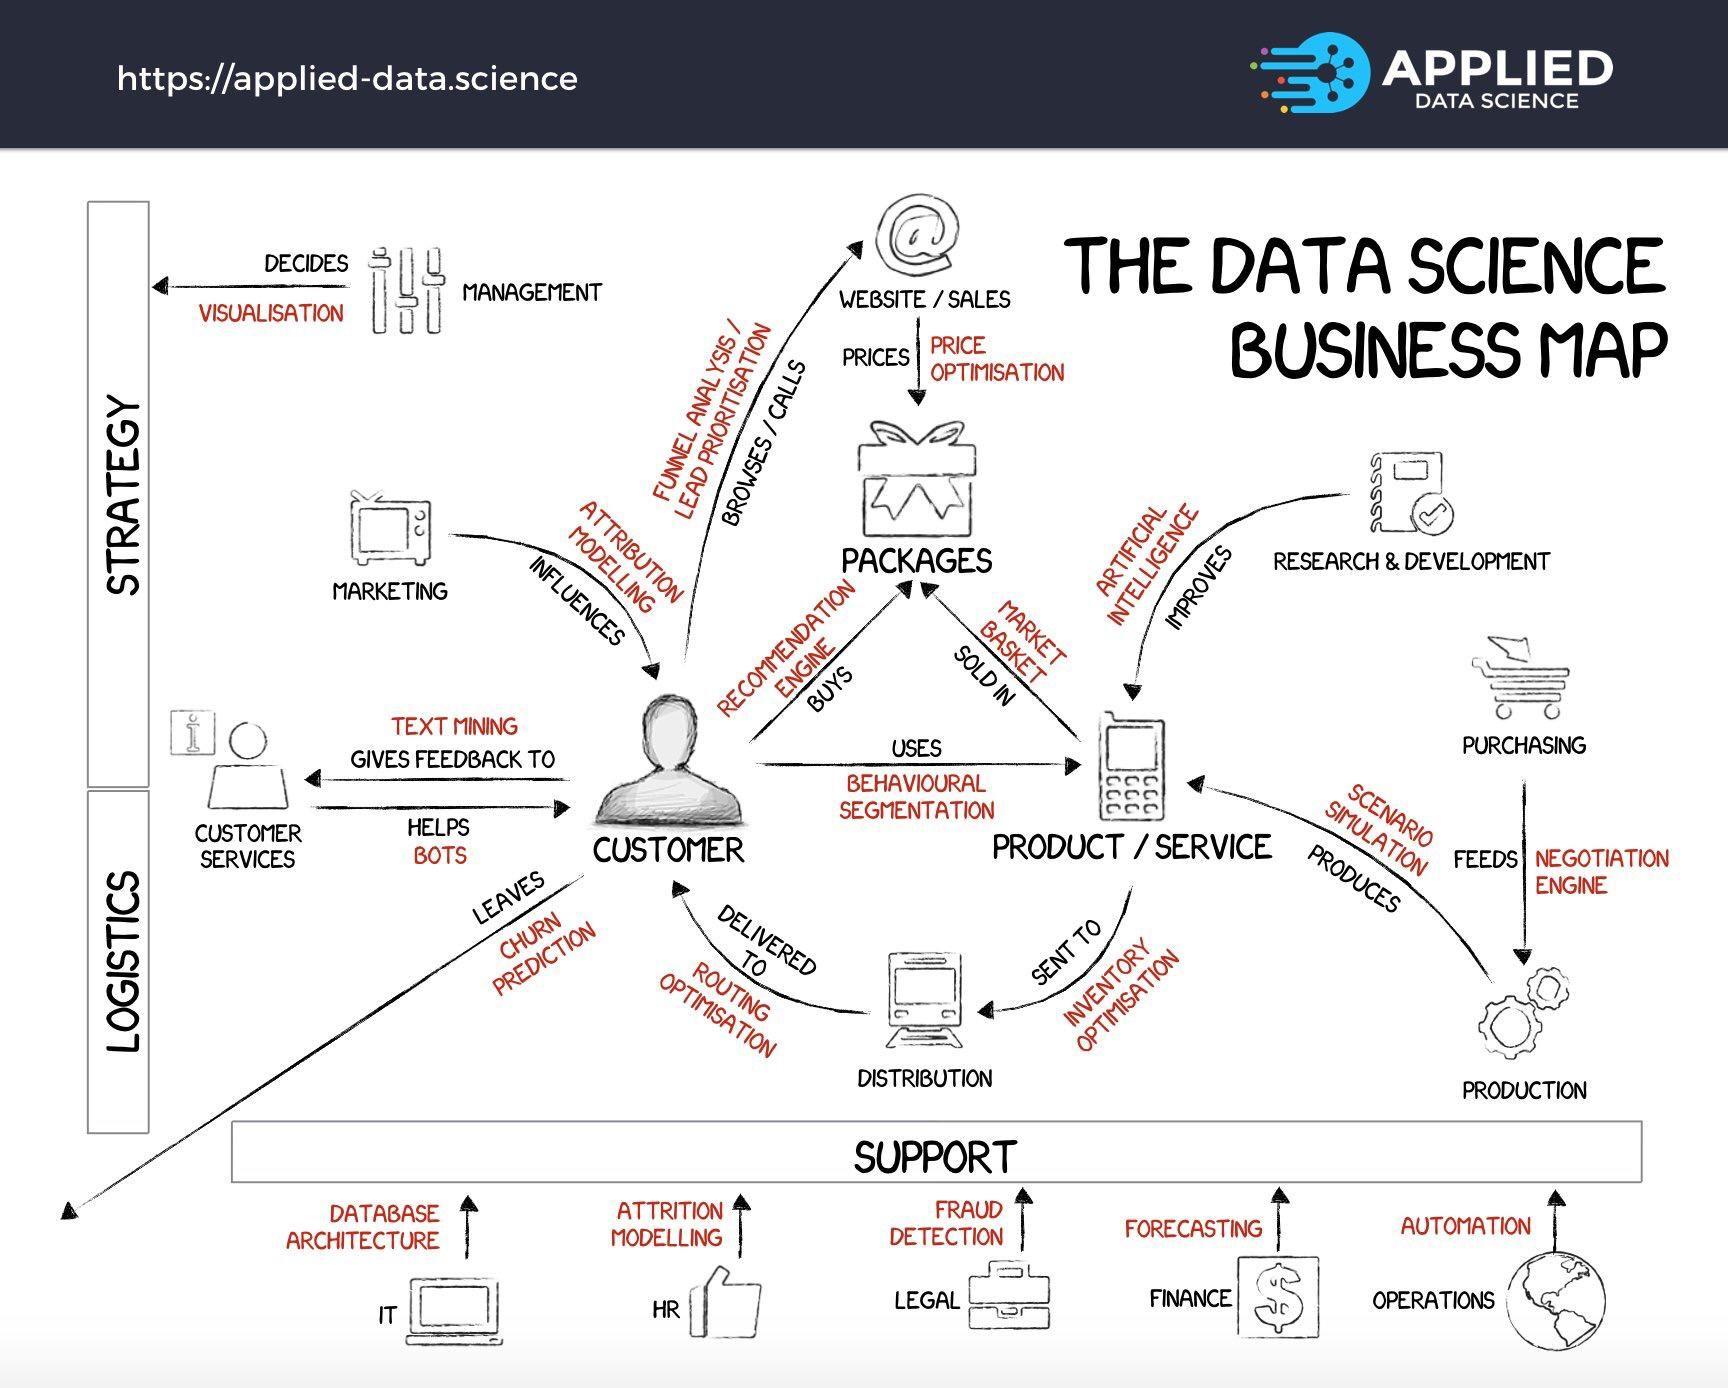 GitHub - kenithgrey/ggQC: ggQC | Data Science | Data science